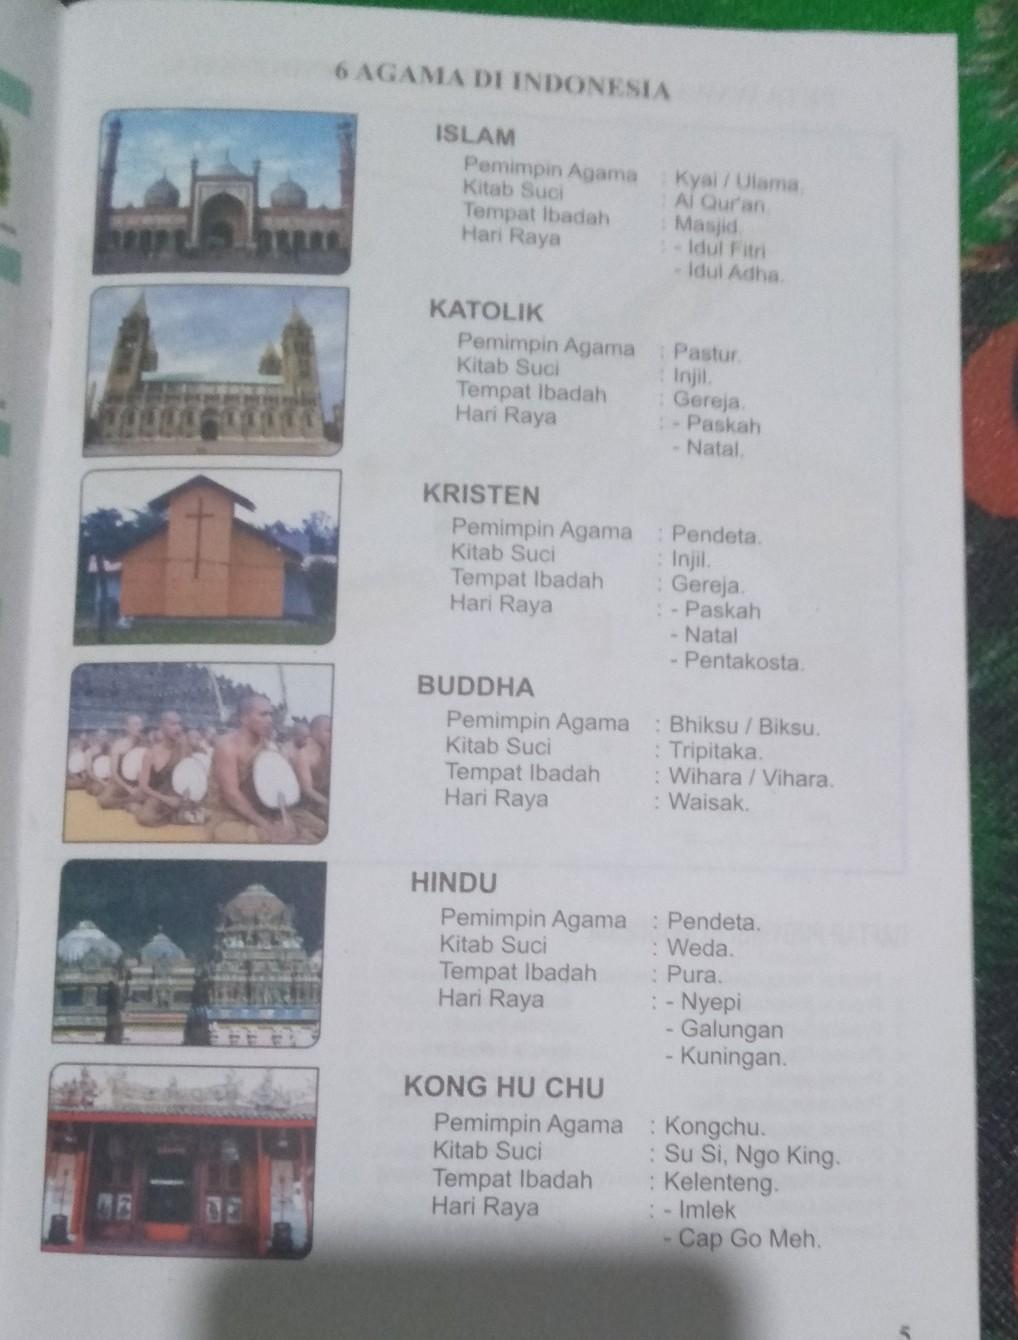 Nama Hari Besar Agama Islam : besar, agama, islam, Gambar, Tempat, Ibadah,nama, Kitab,hari, Besar,dan, Agama, Indonesia, Brainly.co.id